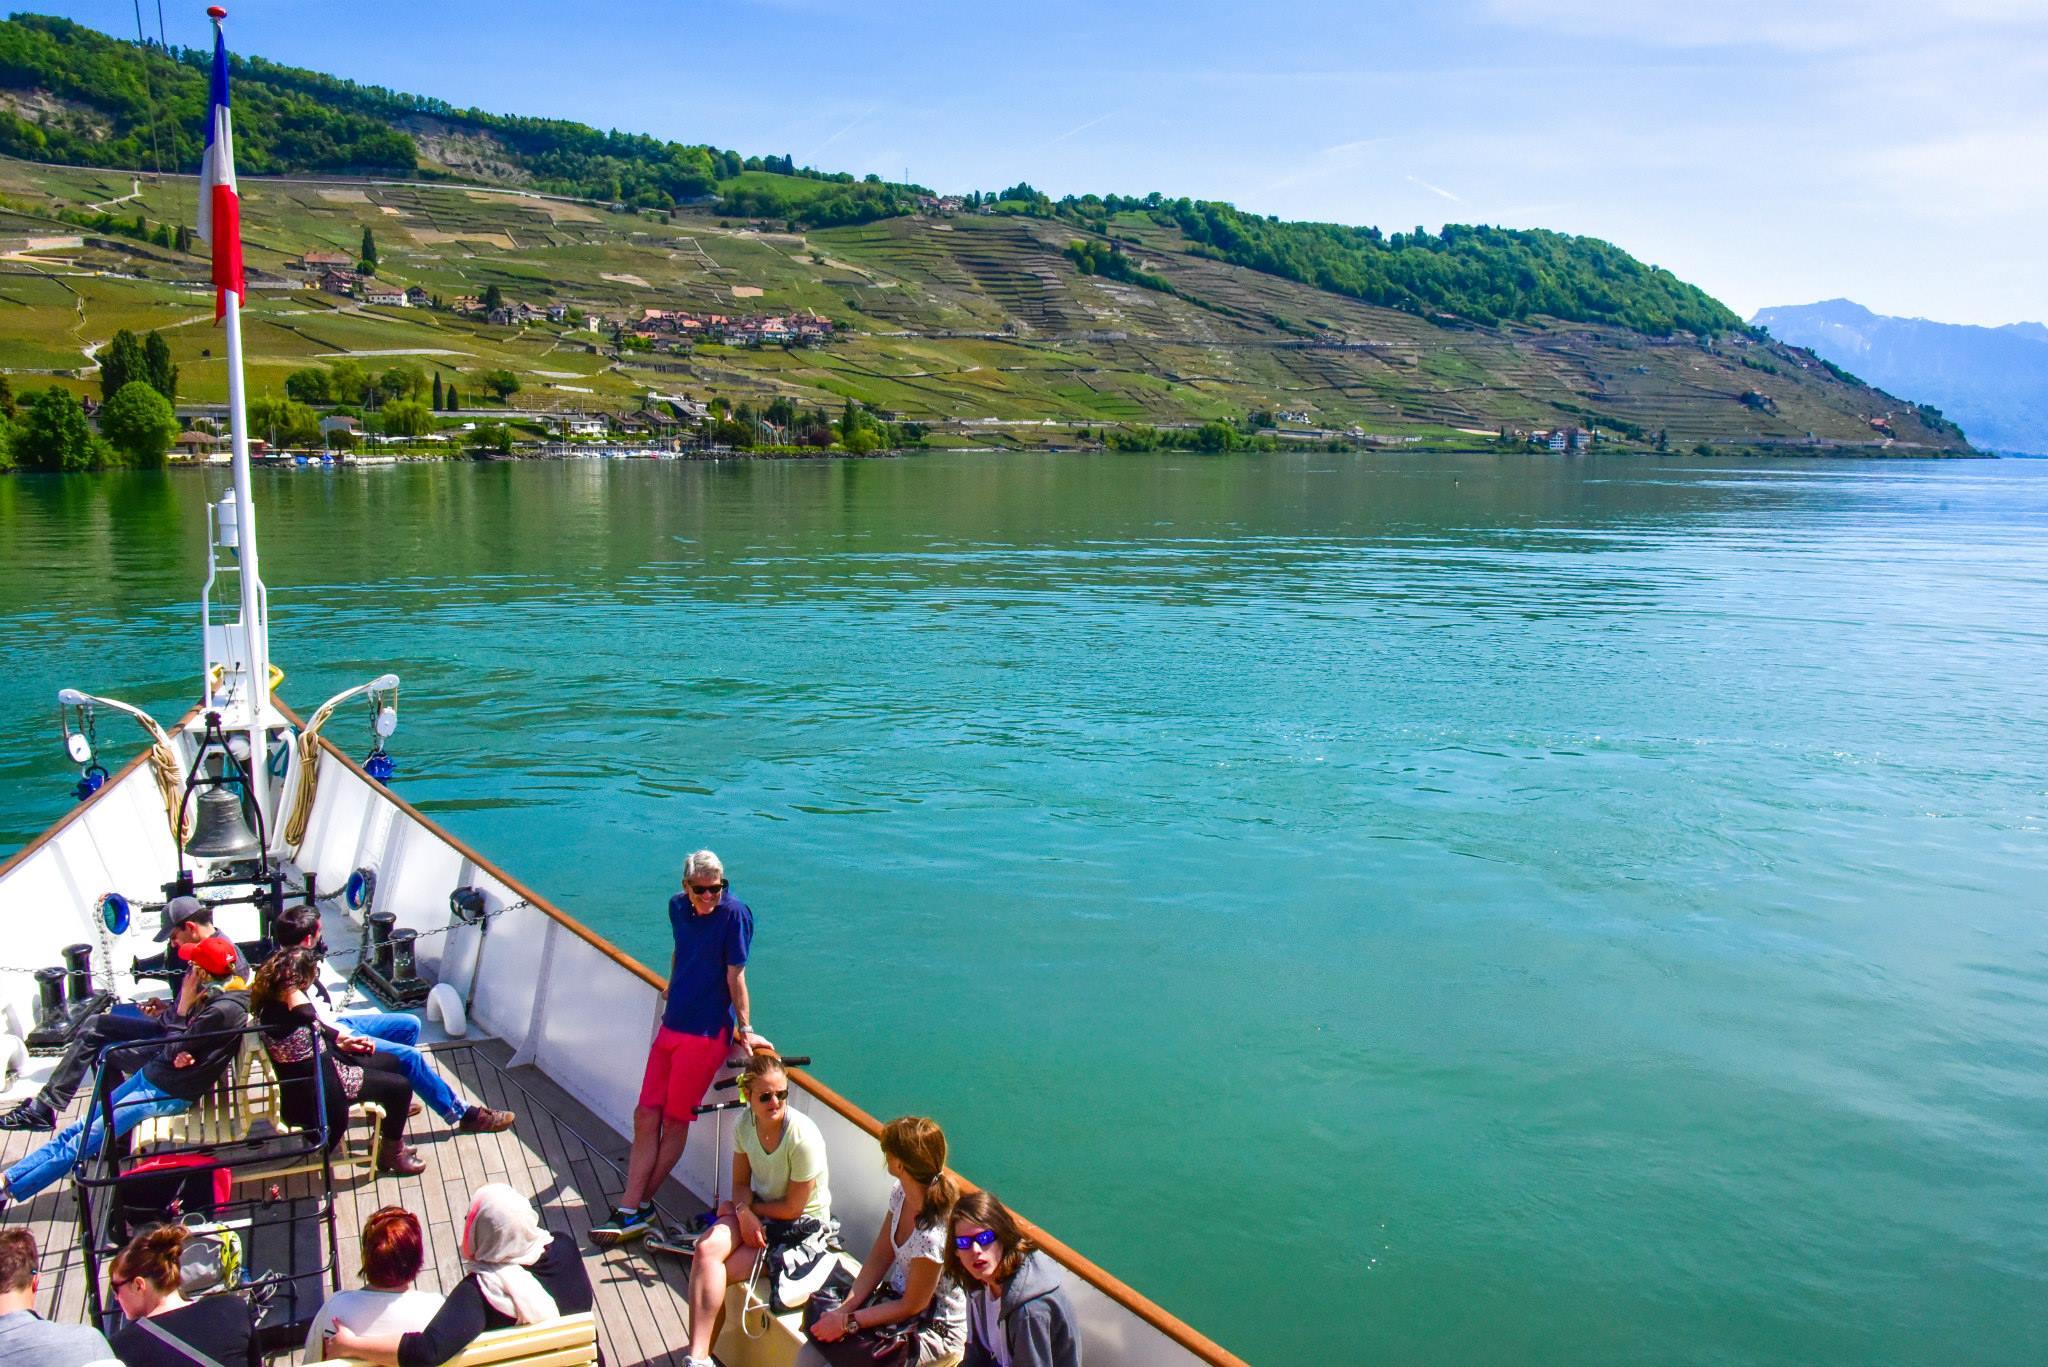 Belle Époque paddle steamboats